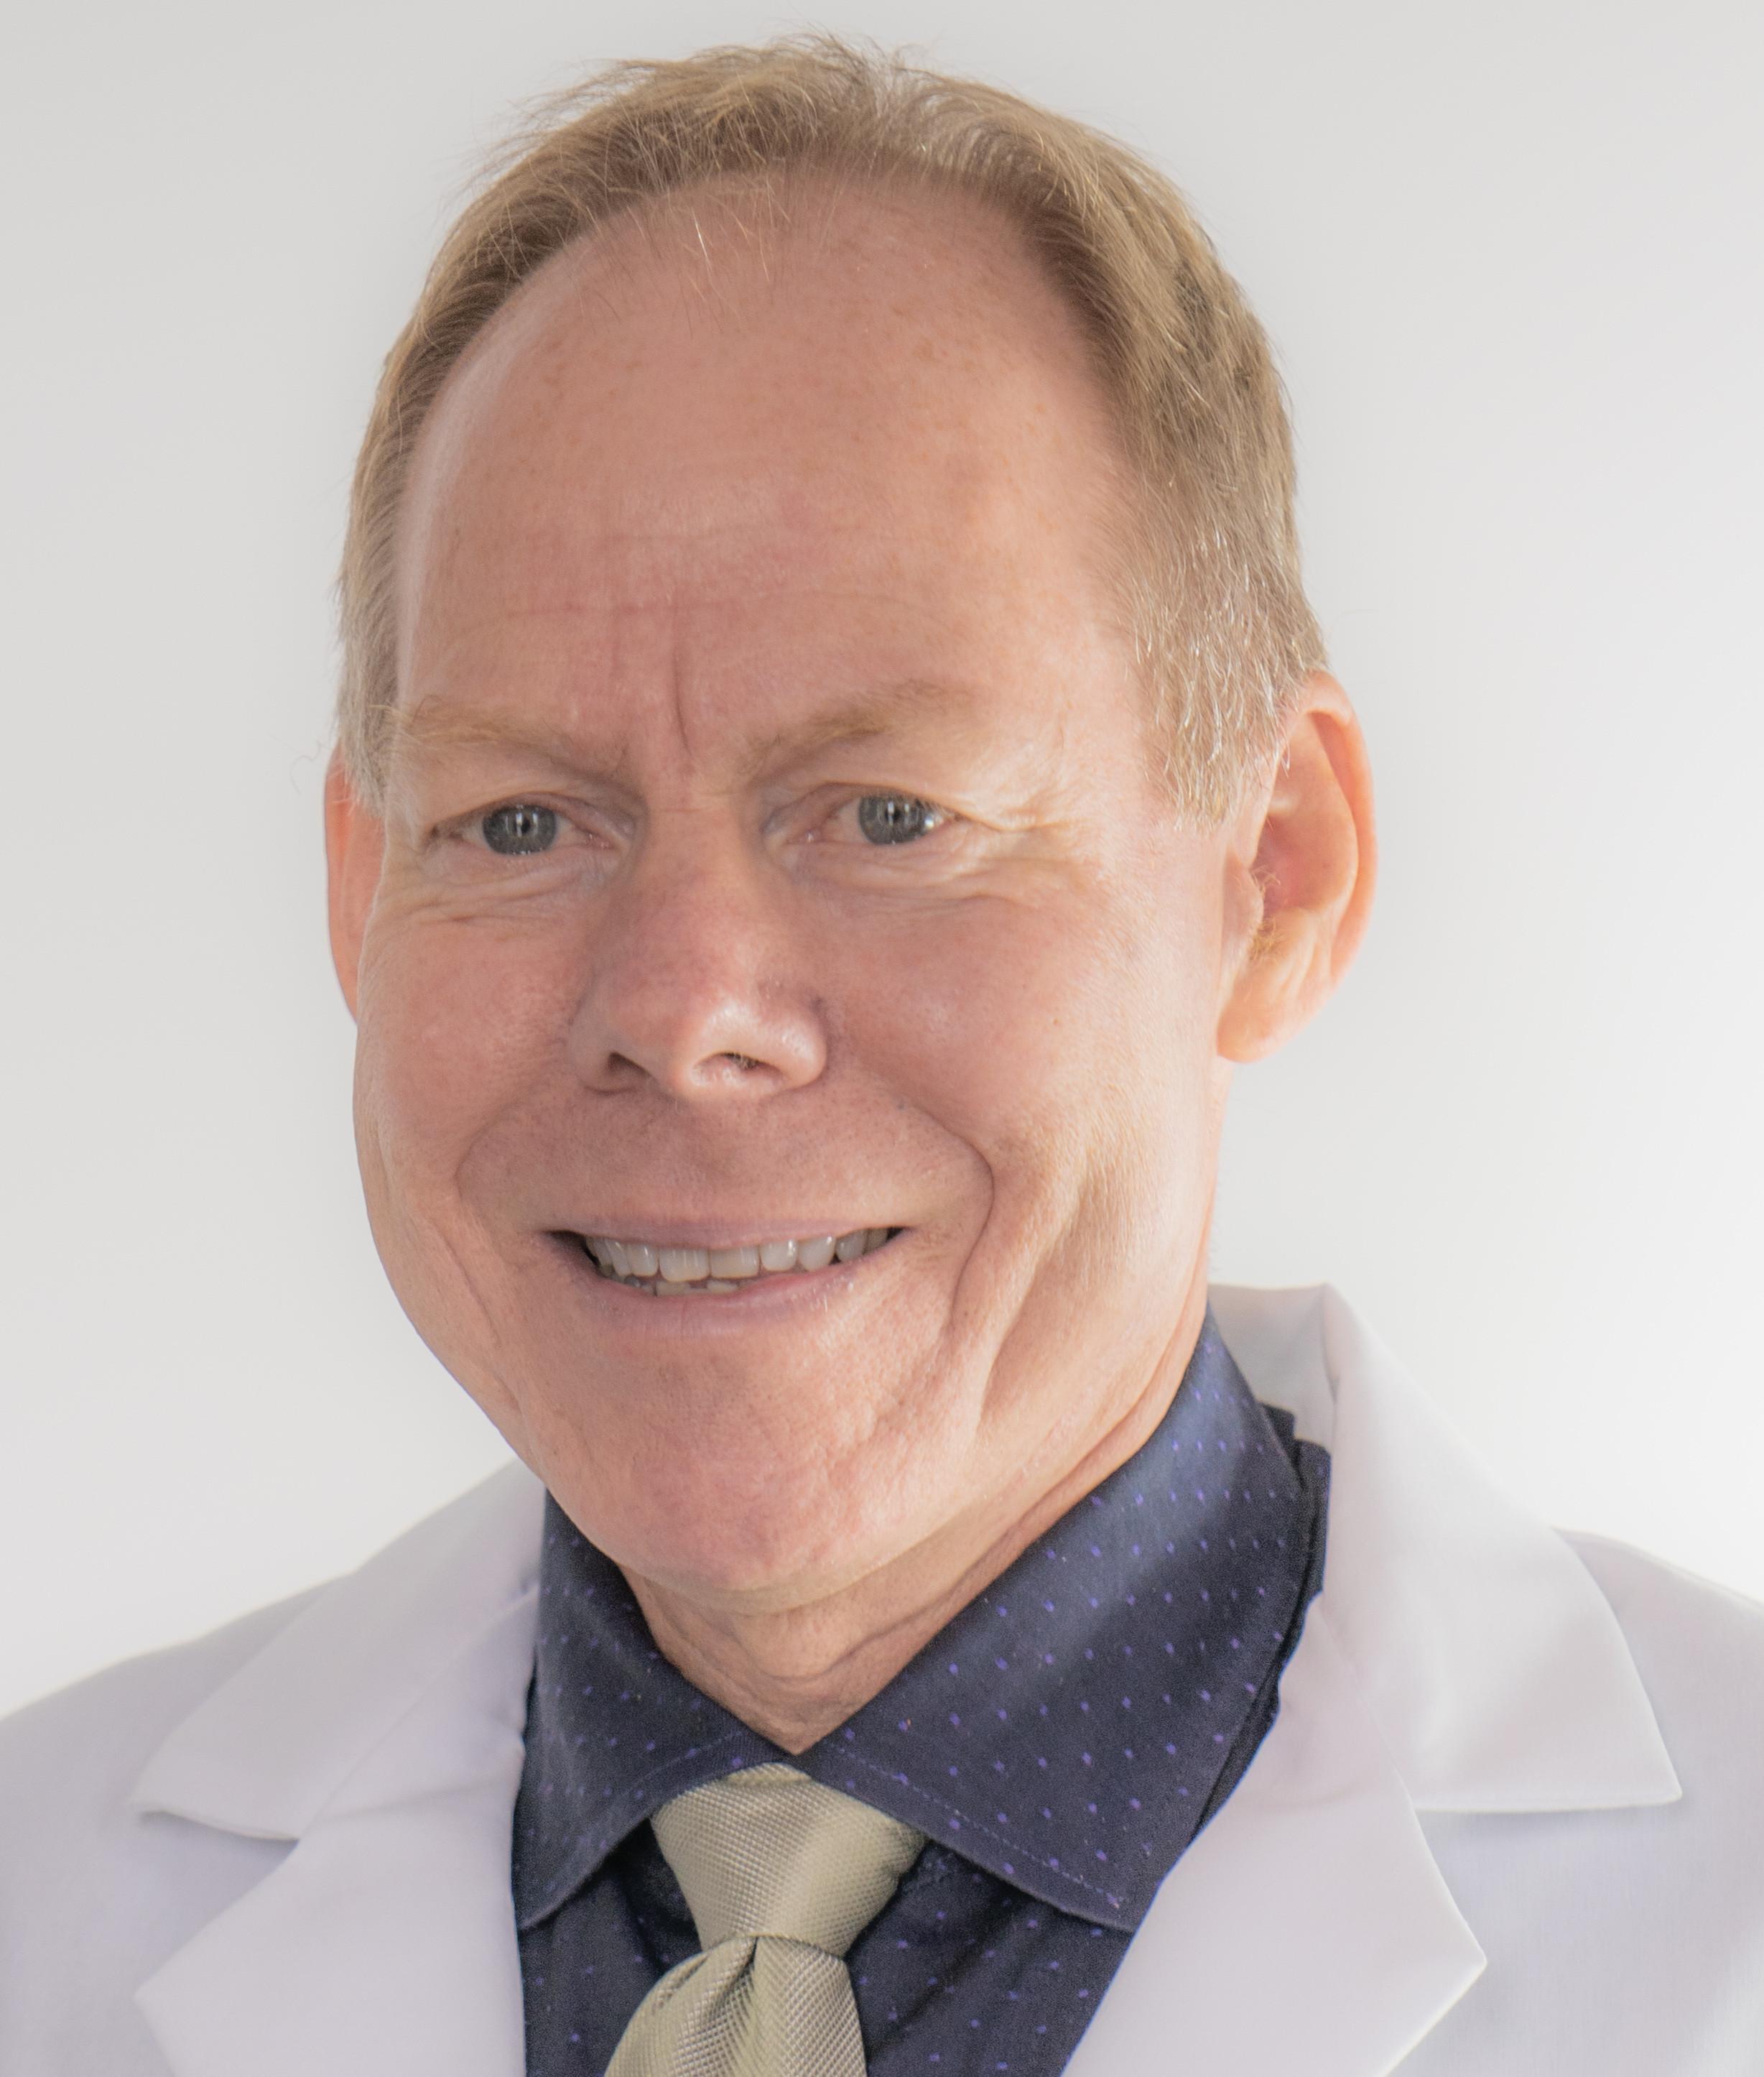 Meet Dr. Tom